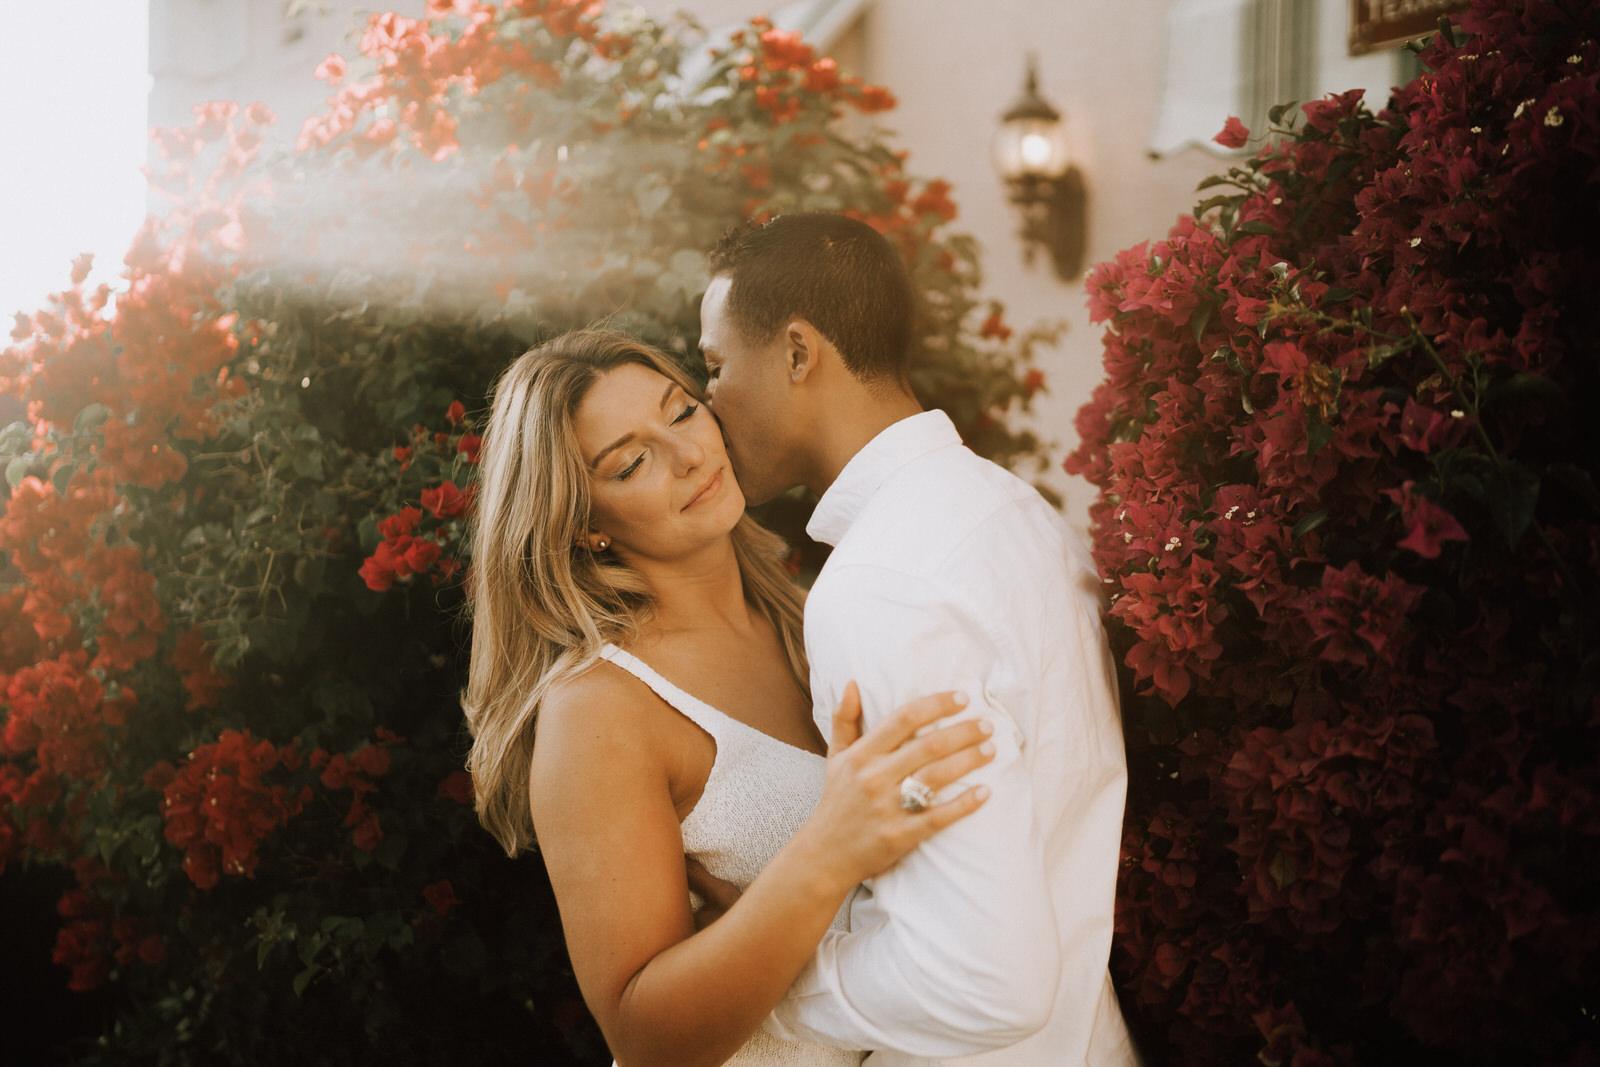 Naples 5th Ave Engagement Photos- Michelle Gonzalez Photography- Michele + Troy-167.JPG